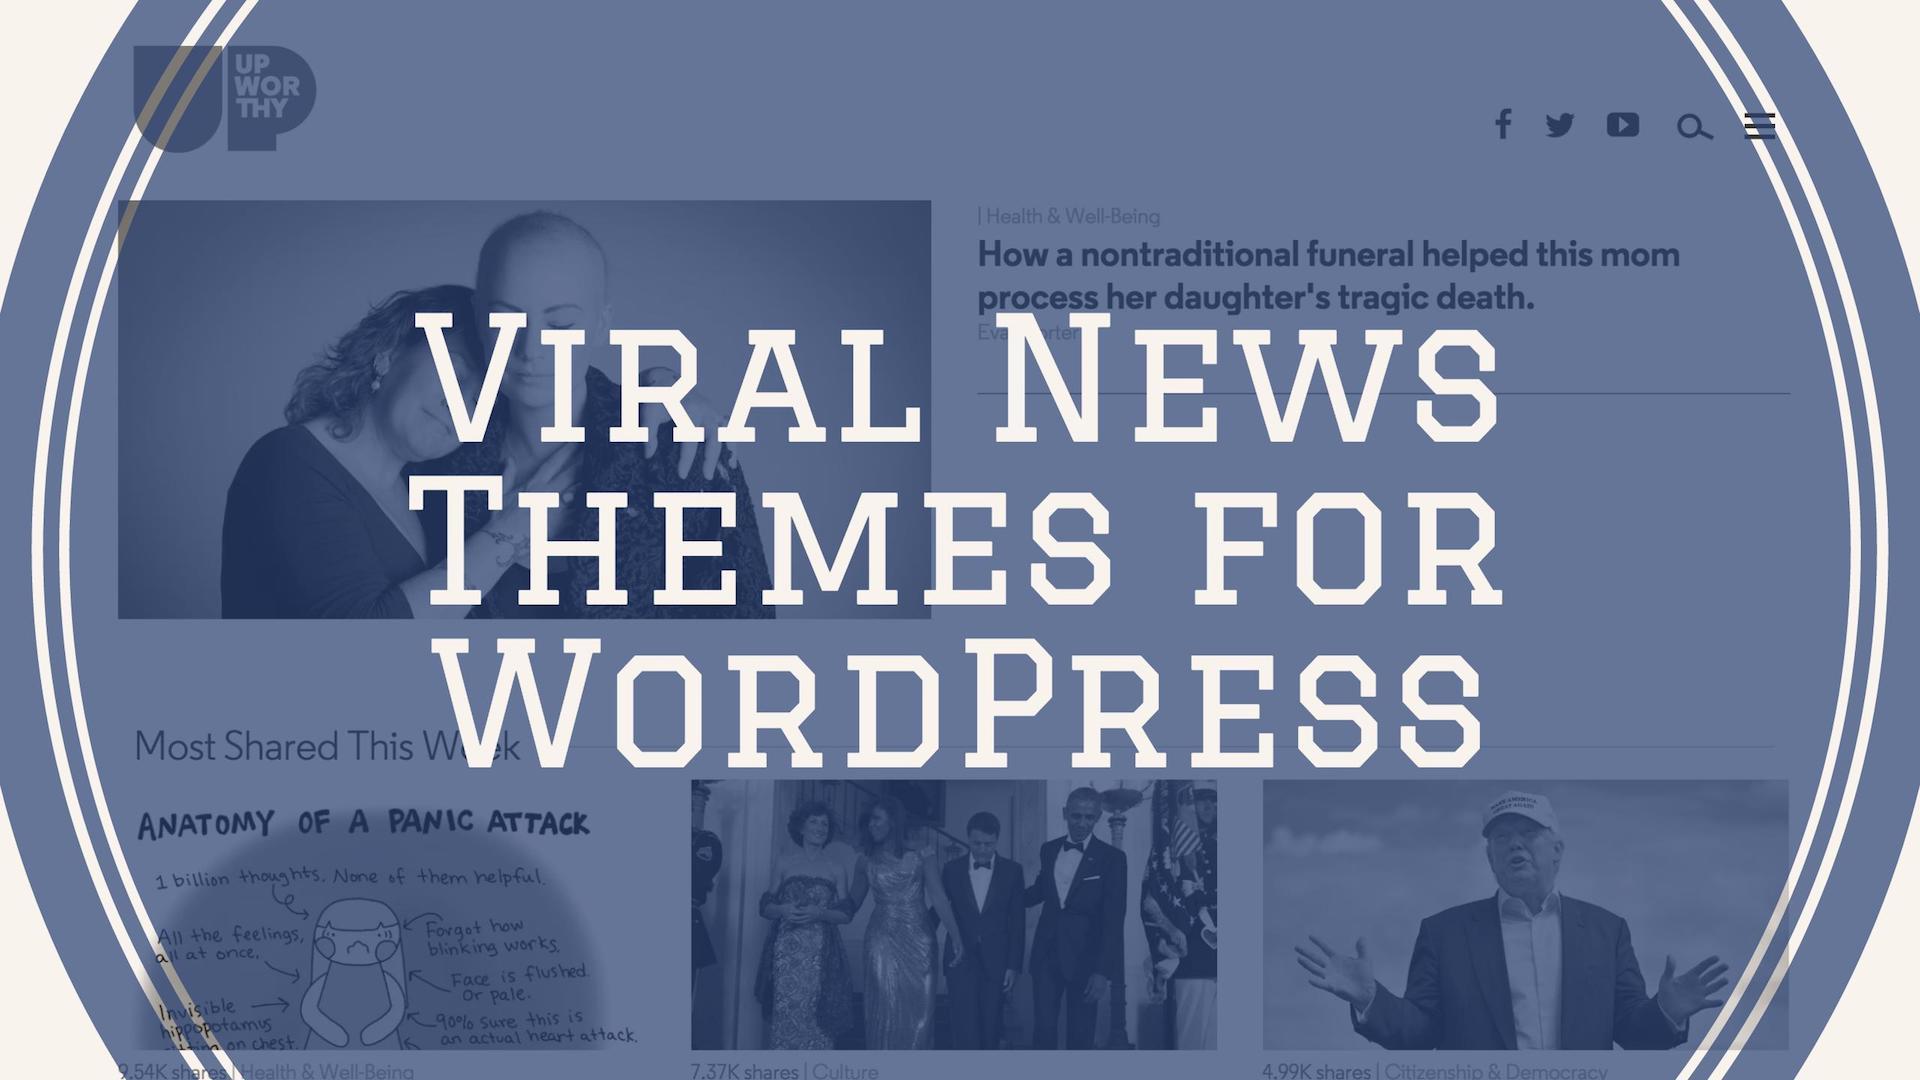 Top 22 Free & Premium Viral News & Buzz Themes For WordPress 2019